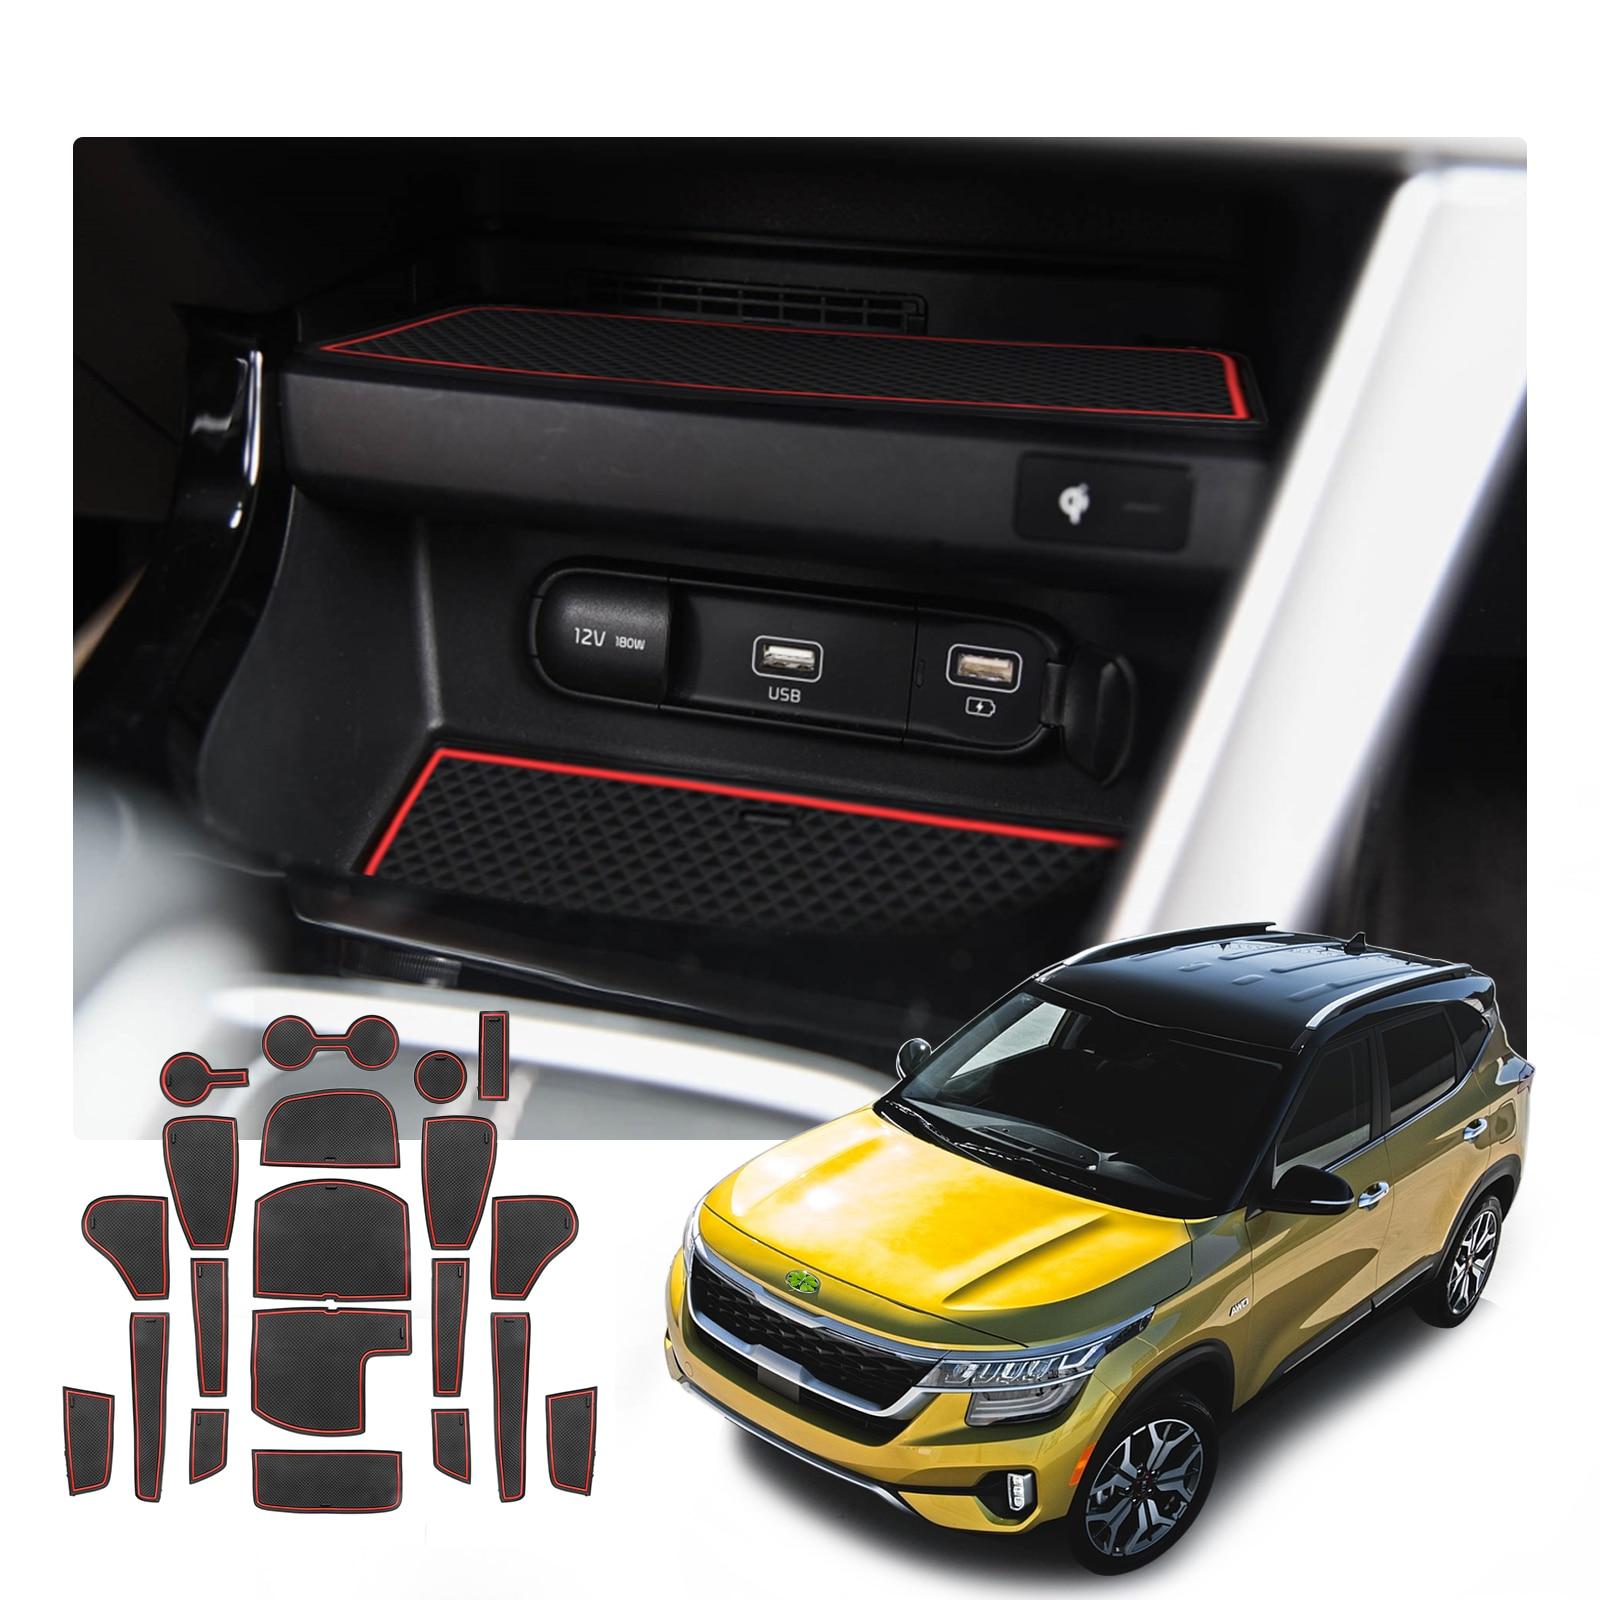 RUIYA Car Door Groove Mat For Seltos 2021/Celltos 2019 2020 Anti-Slip Gate Slot Pads Auto Interior Accessories Red/White 20 Pcs